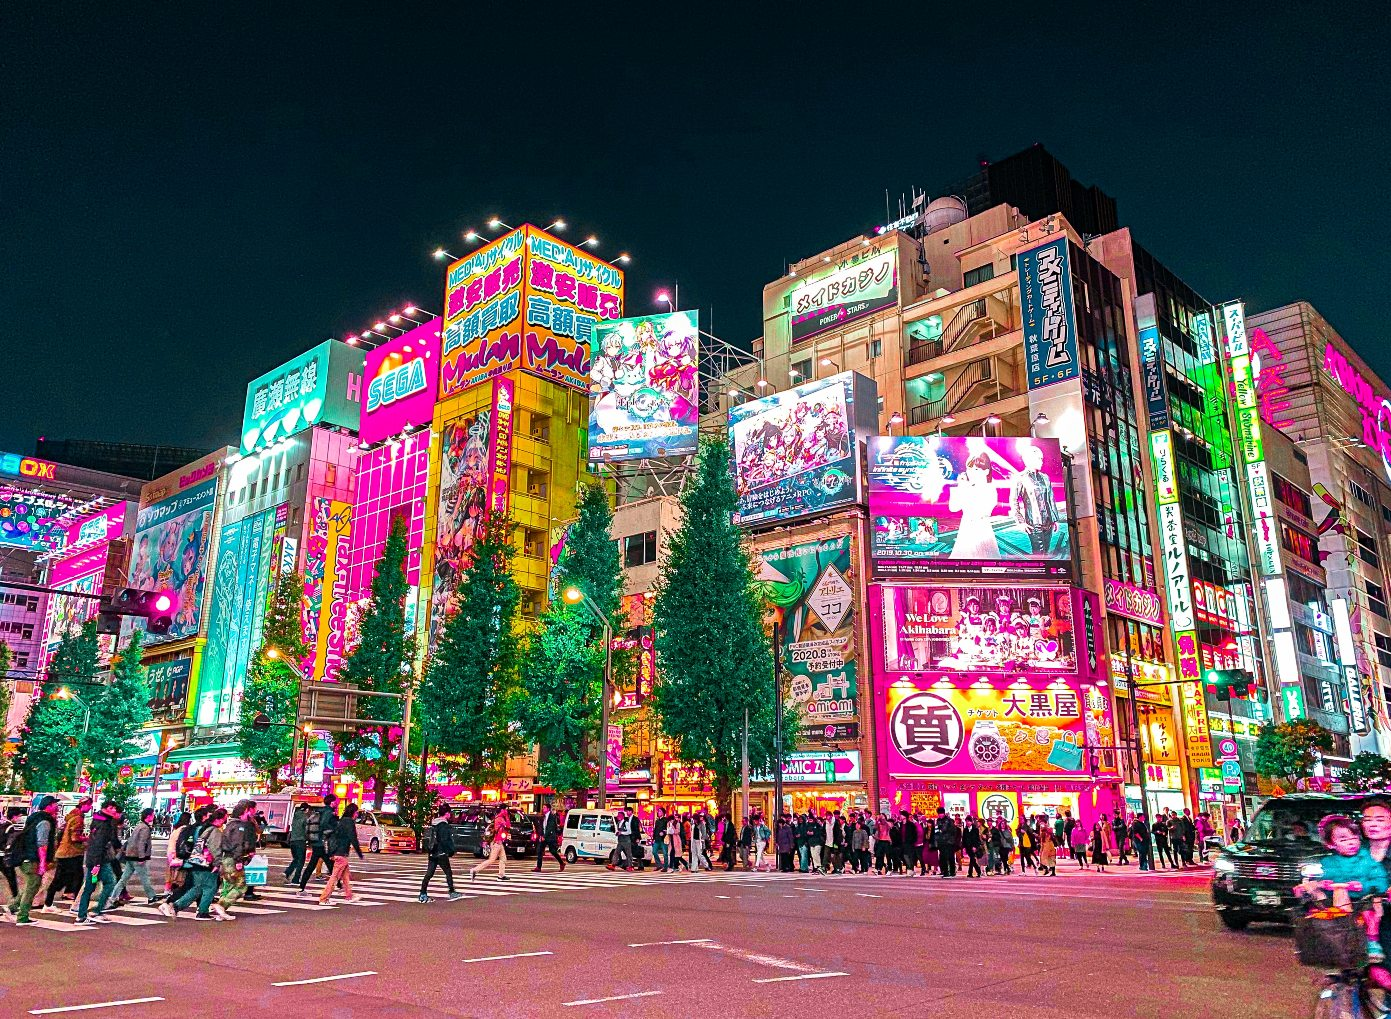 Japan Lifelong Learning